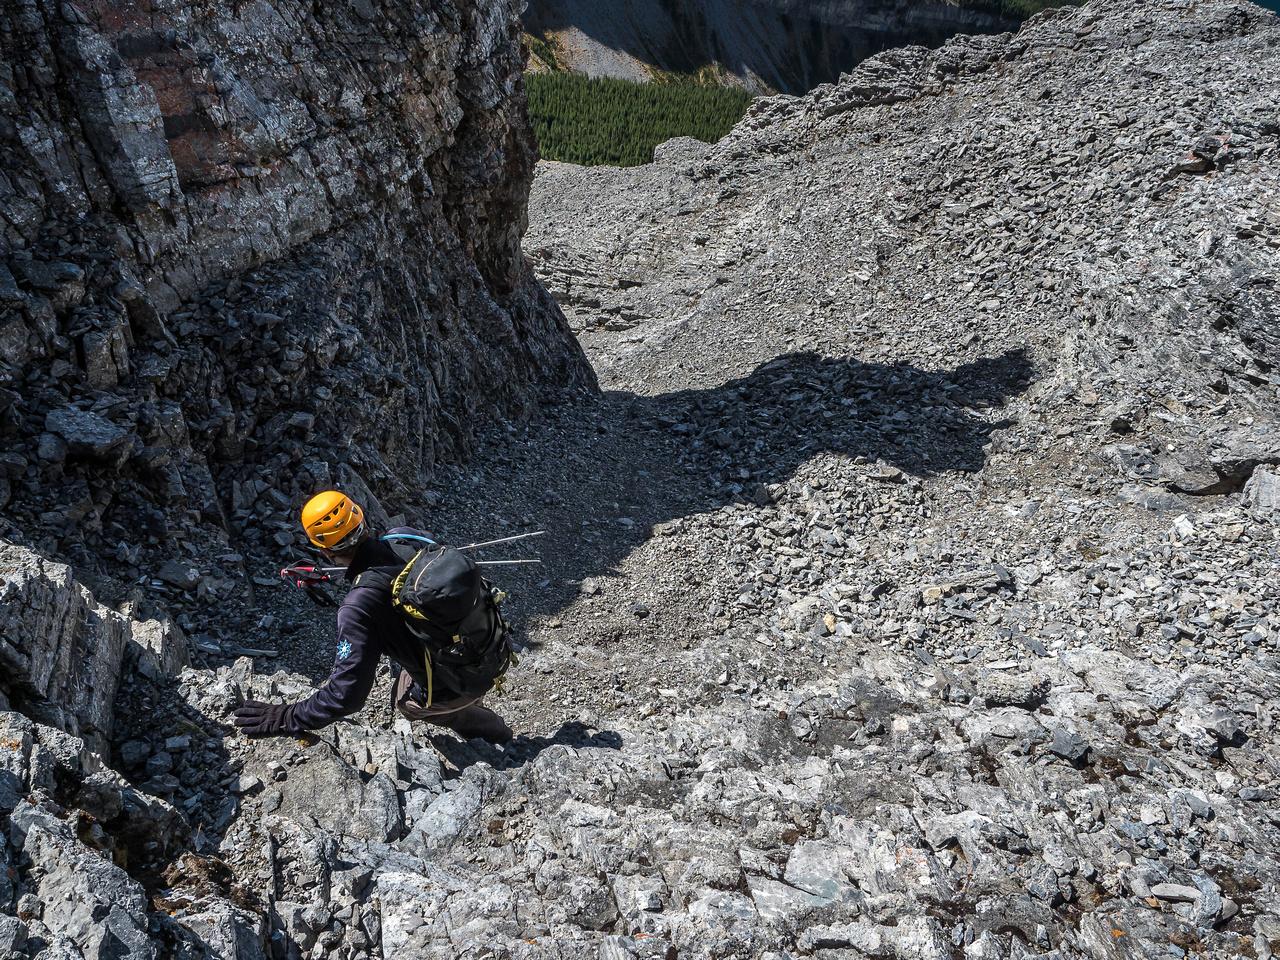 Descending below the crux towards the south ridge.